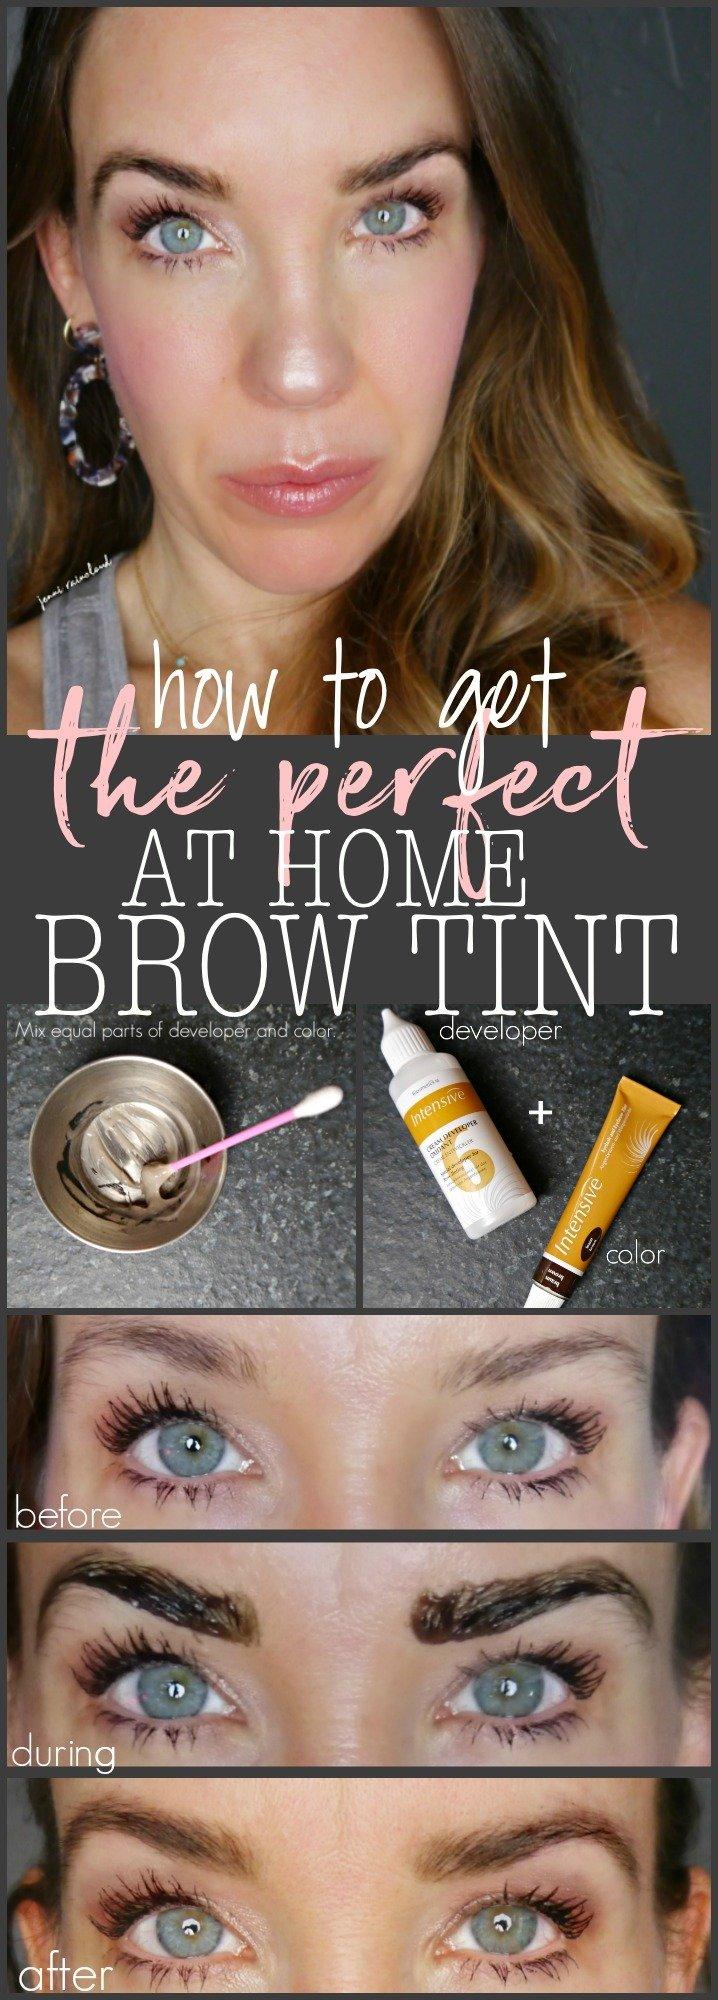 At Home Brow Tint